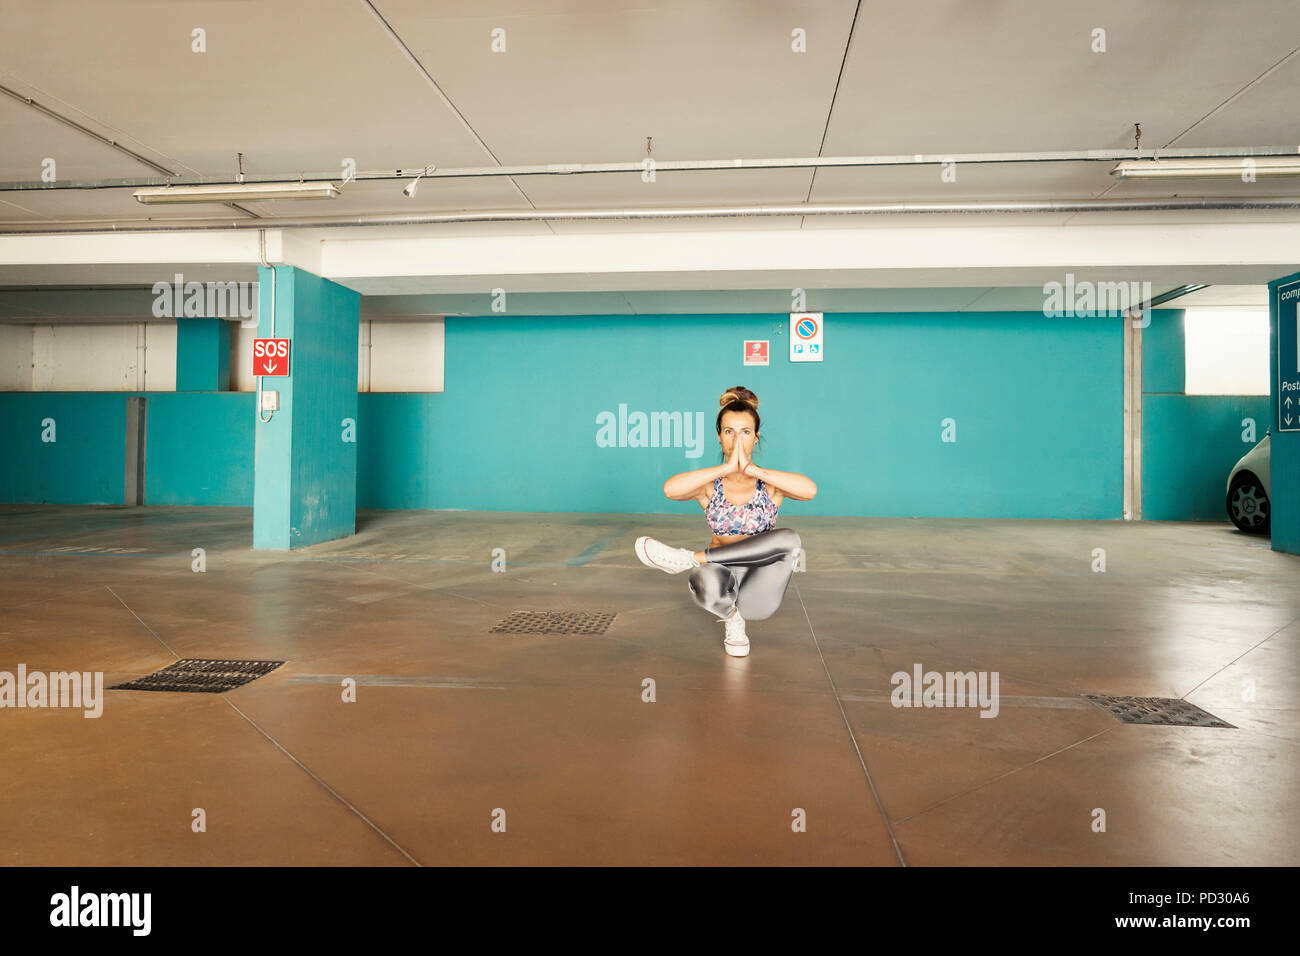 Woman practising yoga in parking lot - Stock Image